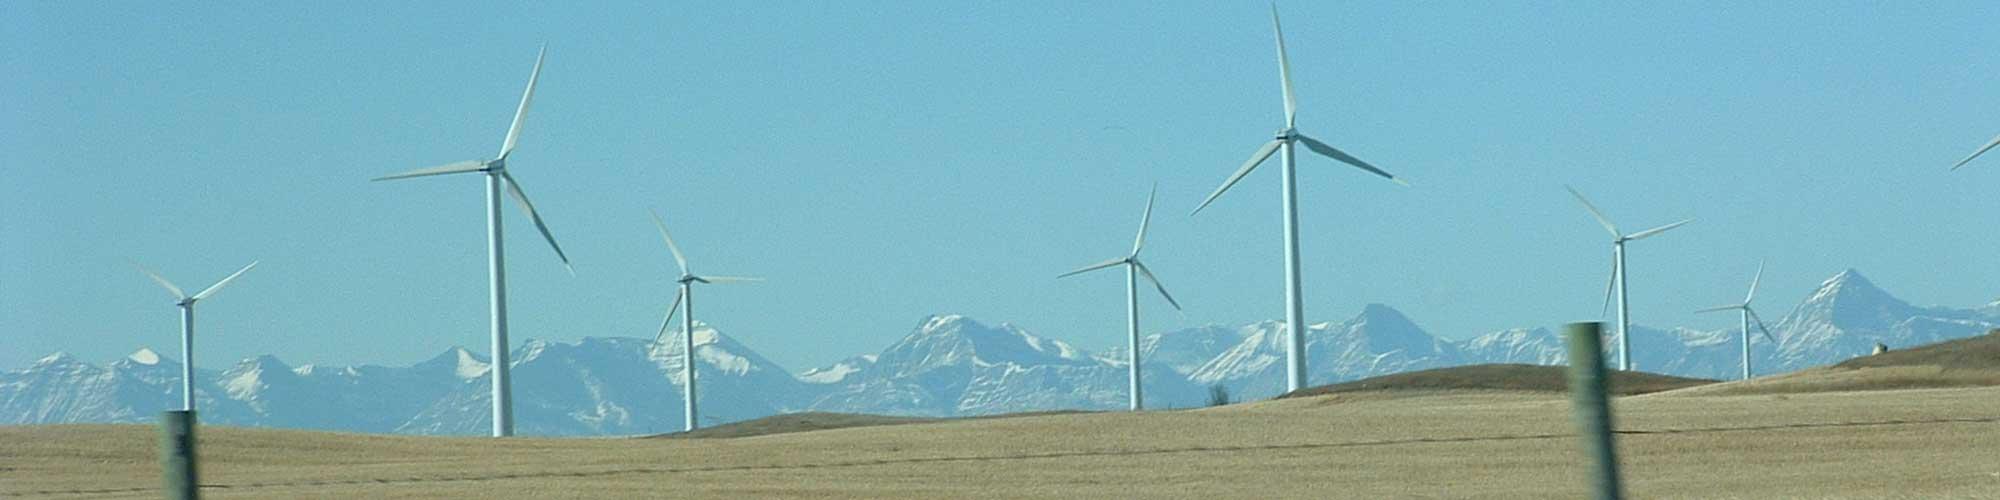 Turbines-w-Mountains-2000x500